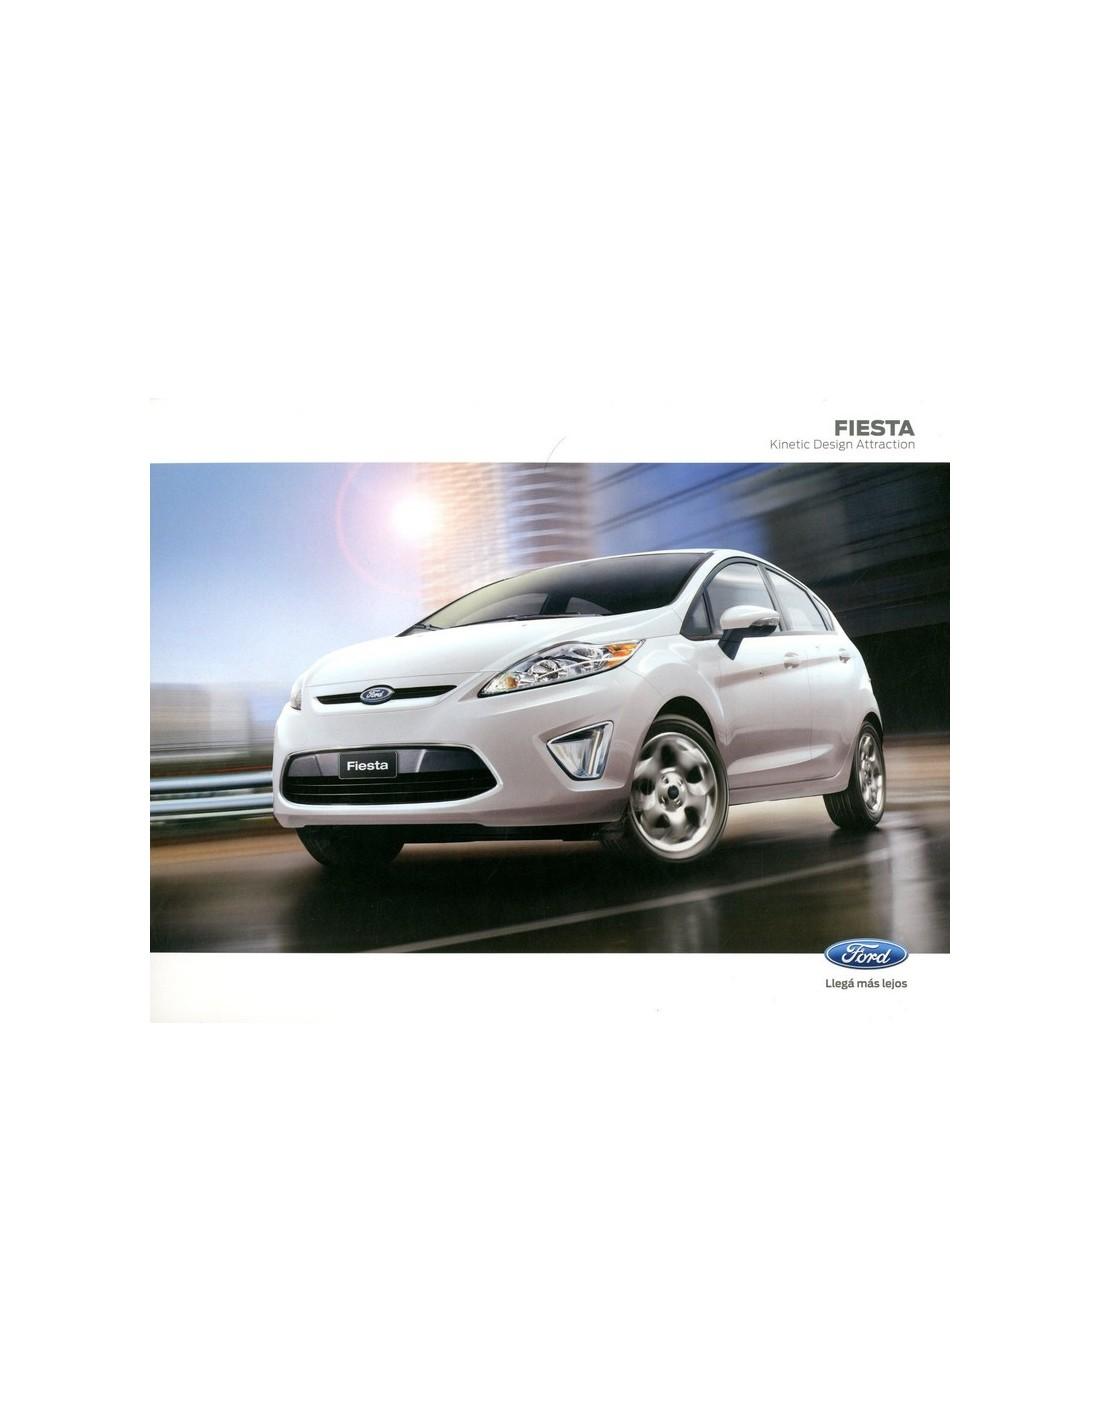 2013 Ford Fiesta: 2013 FORD FIESTA LEAFLET SPAANS